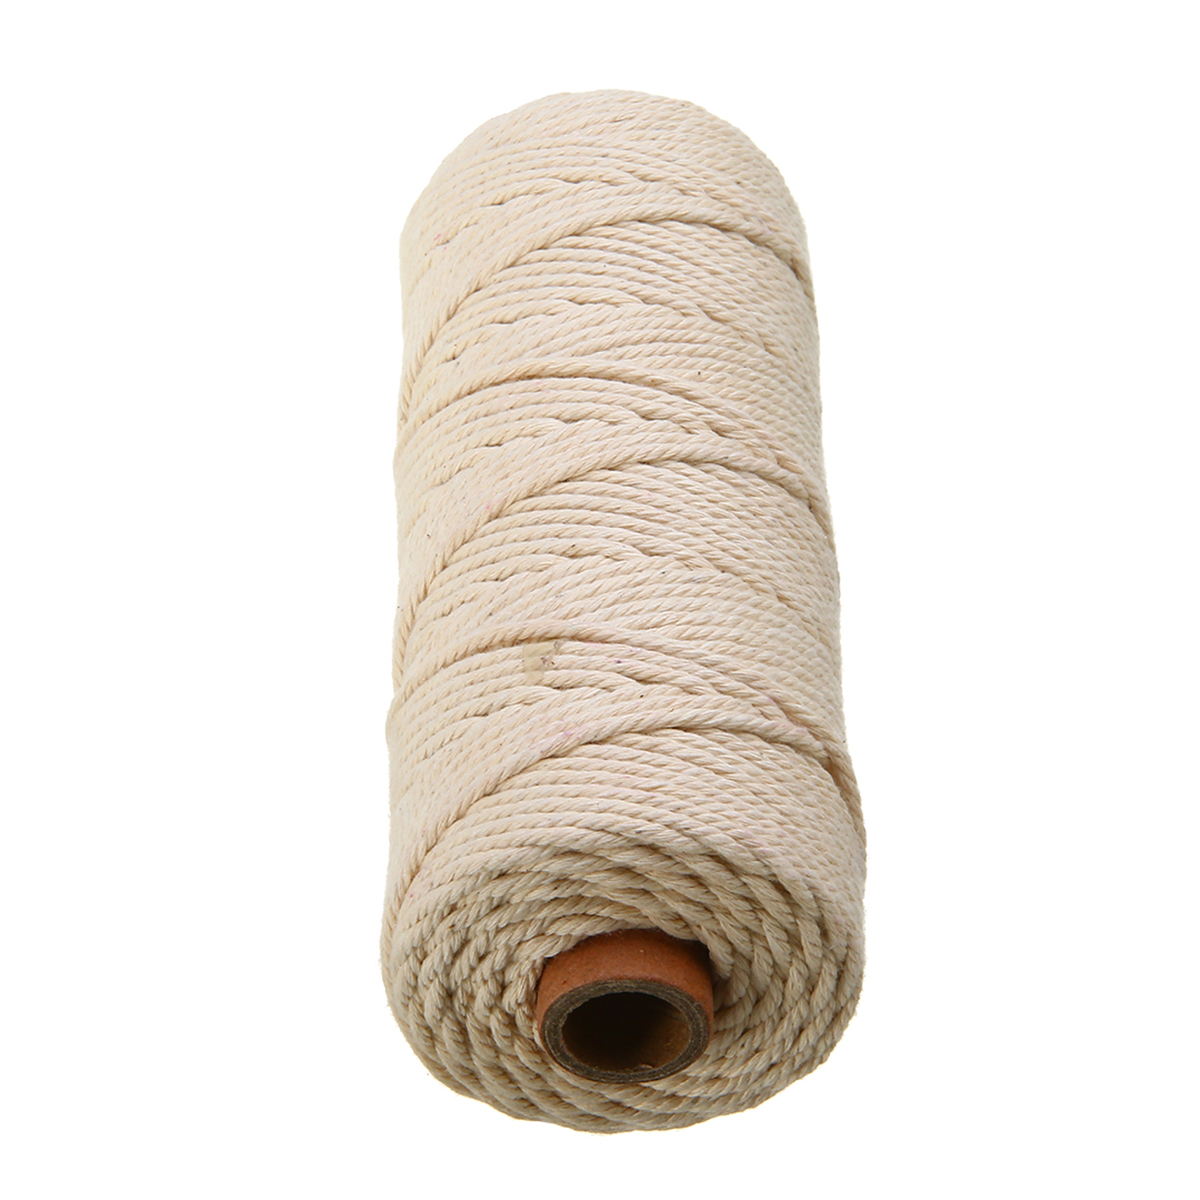 1X Natural Beige Cotton Cord Binding Rope Artisan Handmade Cotton Braided Twist Cord DIY Sewing Fabric Home Decor 3mm Diameter